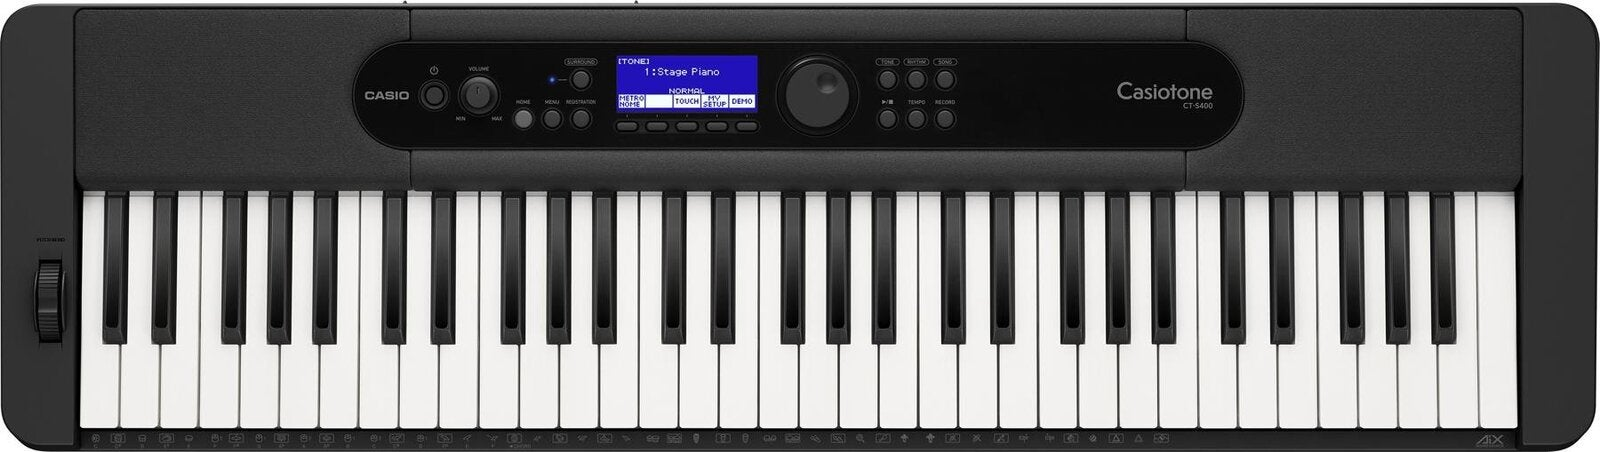 Casio CTS-400 Casiotone 61 Note Digital Keyboard Black